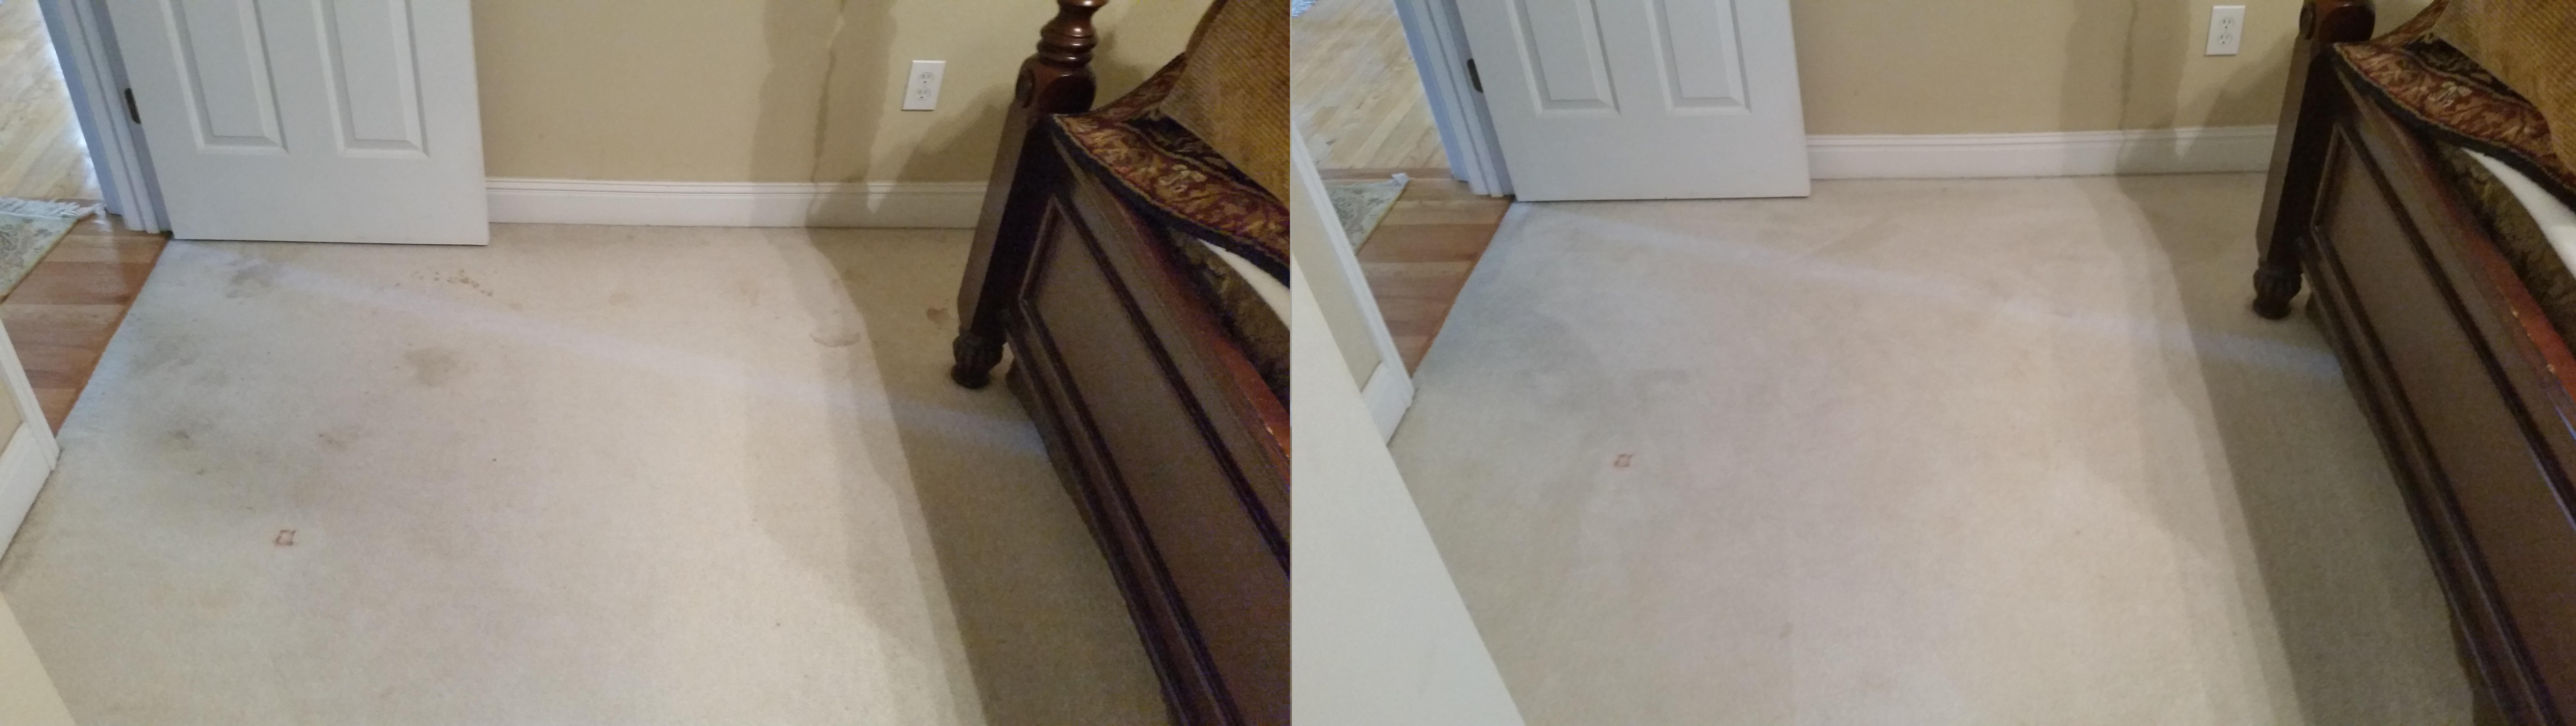 11-10-14-b-a-citrusolution-carpet-cleaning-suwanee-4